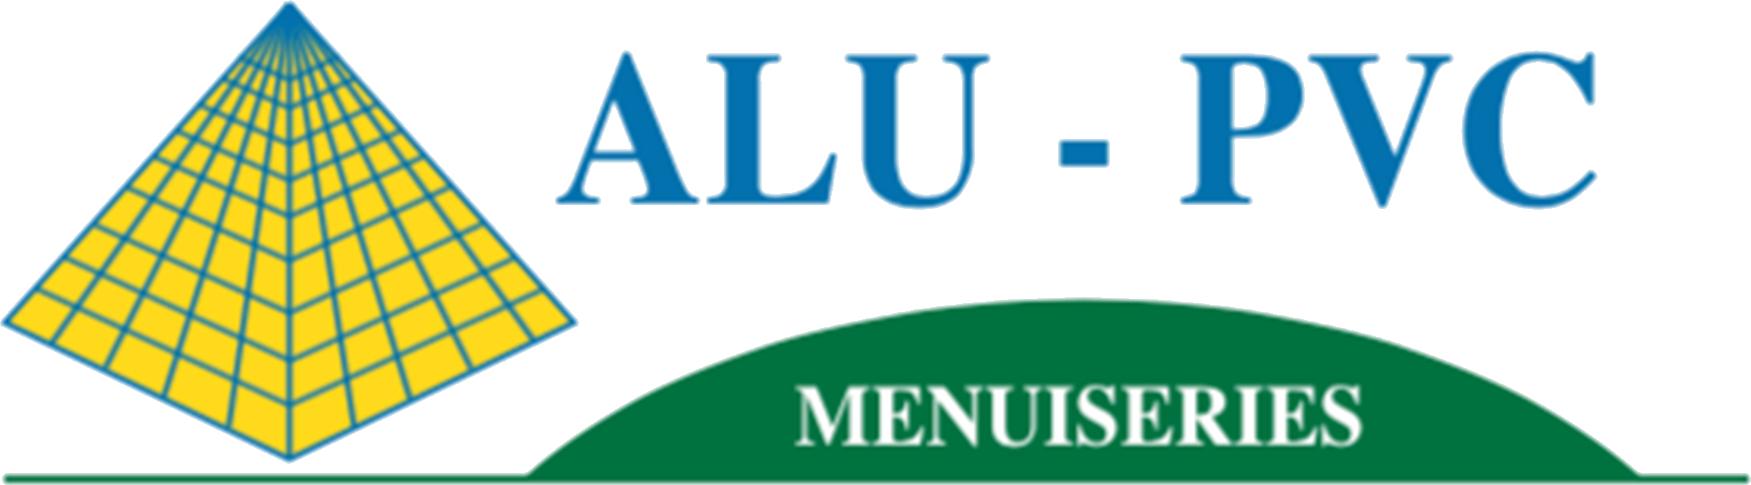 Logo de l'entreprise Alu Pvc Menuiseries